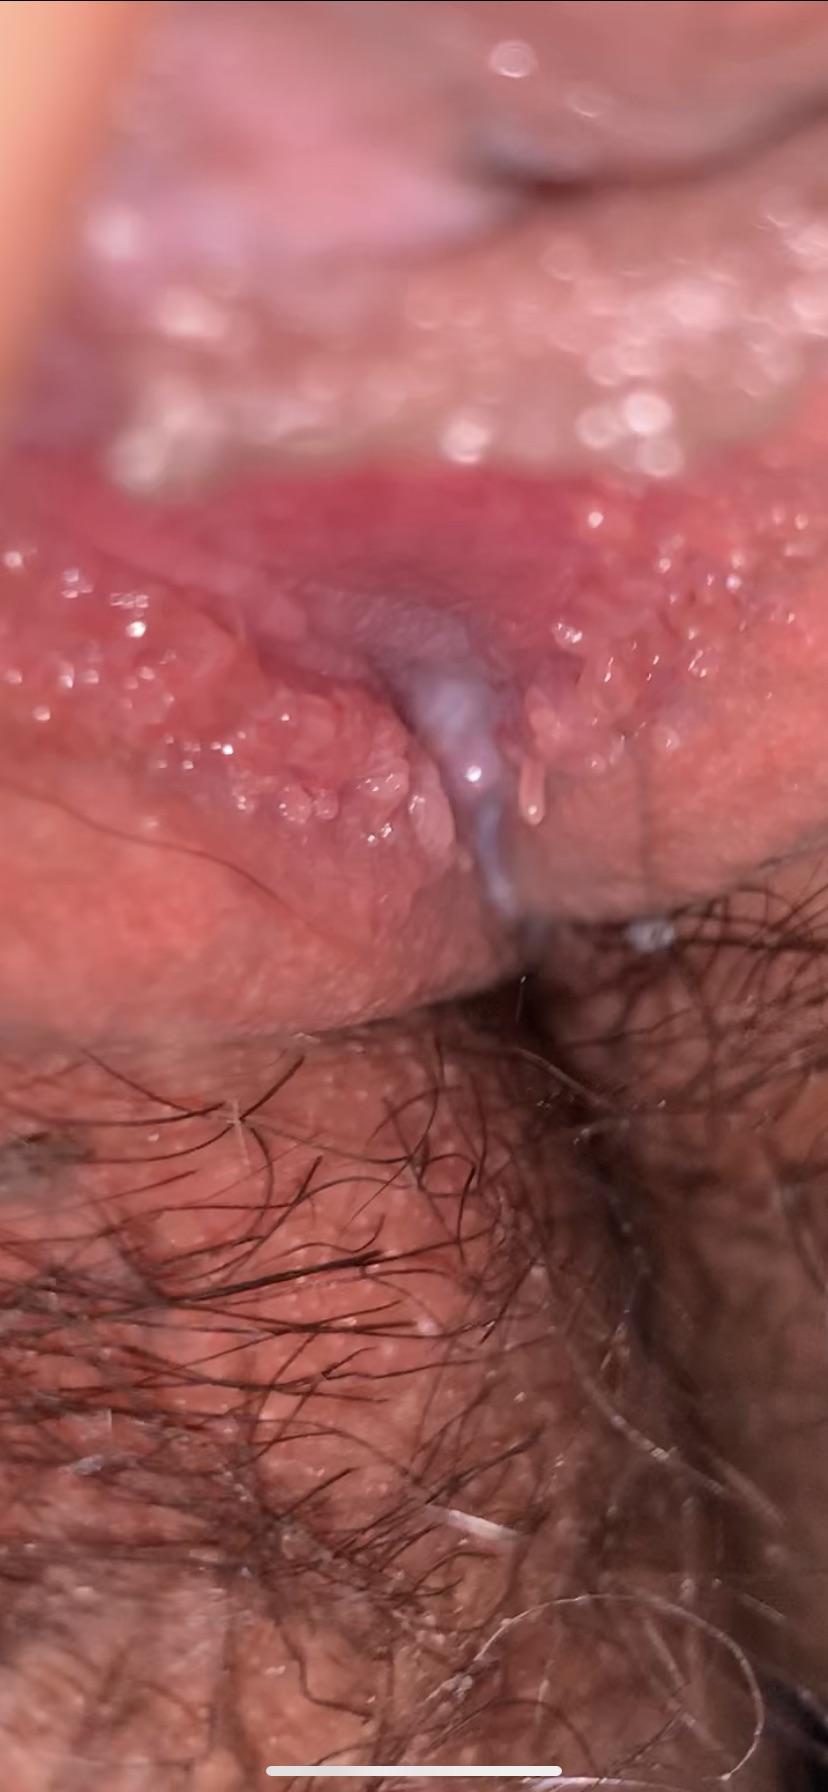 vestibular papillae